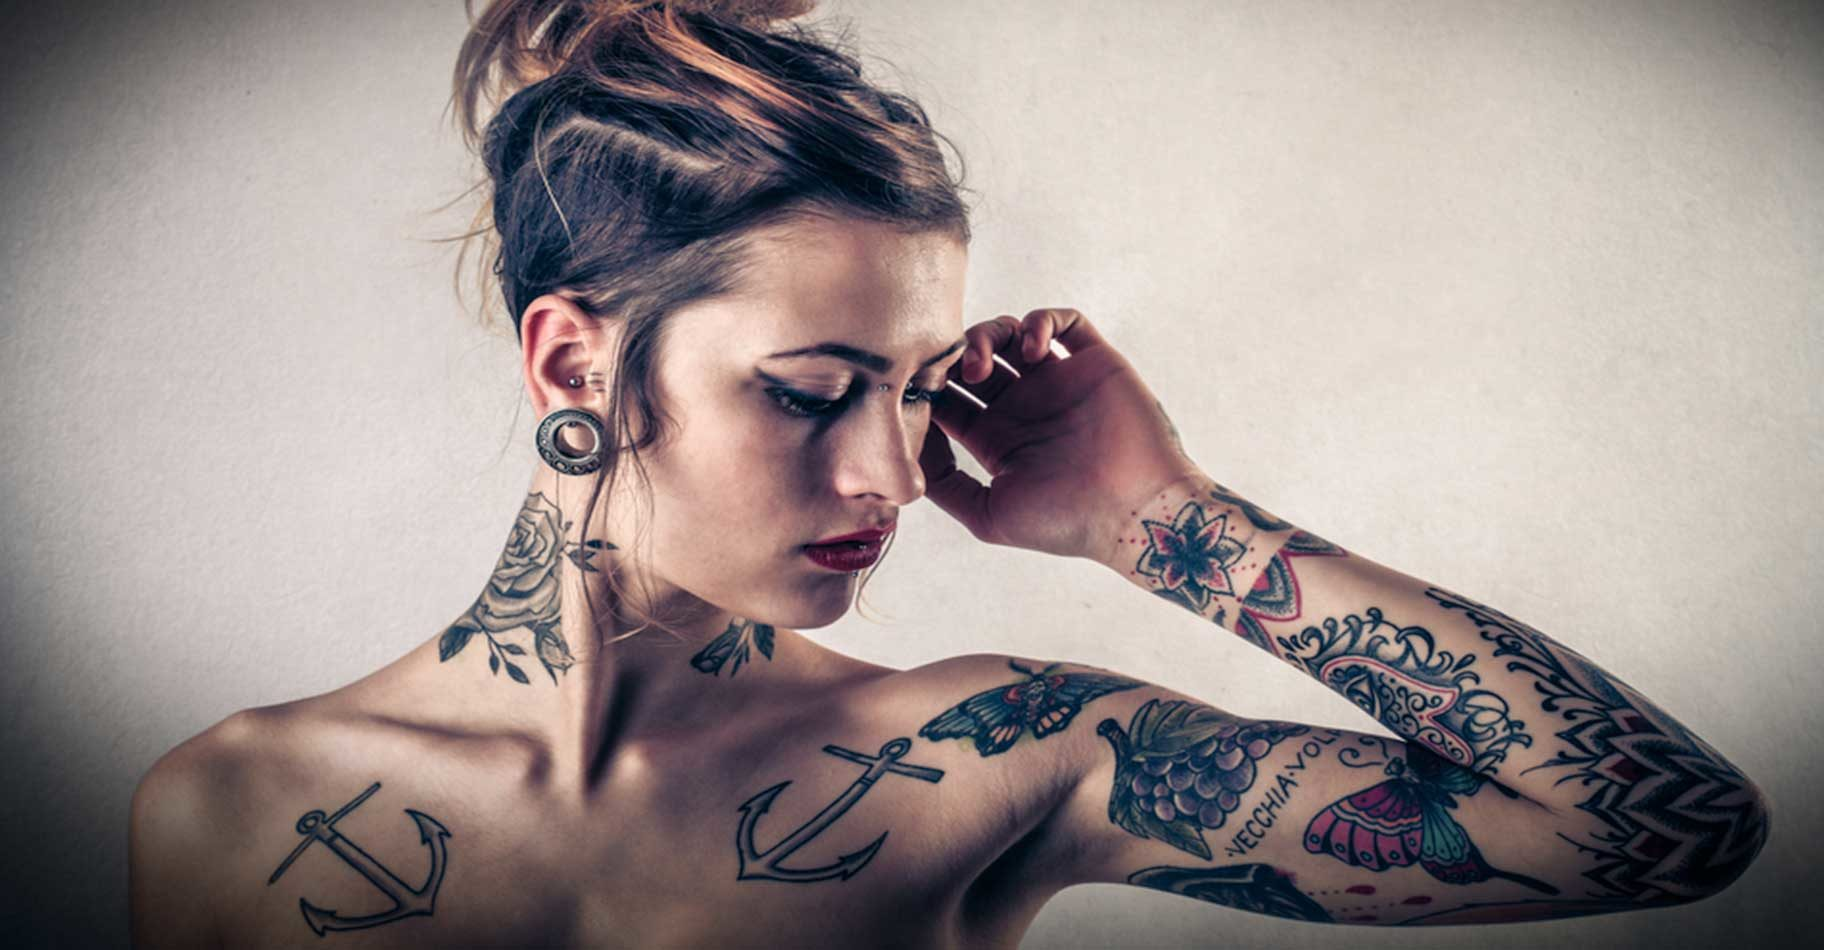 tattoos the